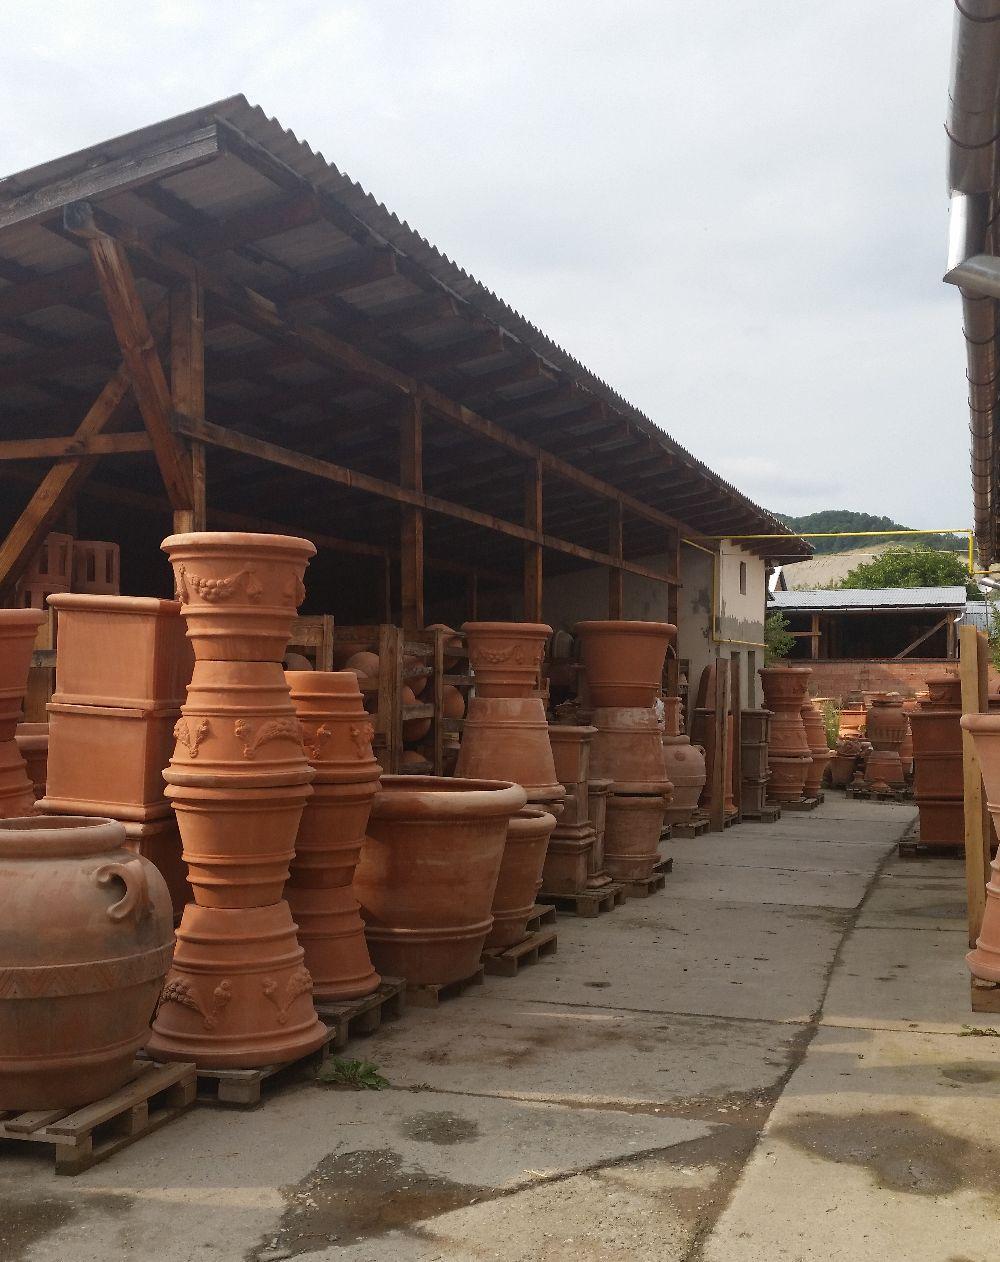 adelaparvu.com despre vase de gradina, ghivece si ornamente din teracota, lut, Terecote Sighisoara Romania (13)